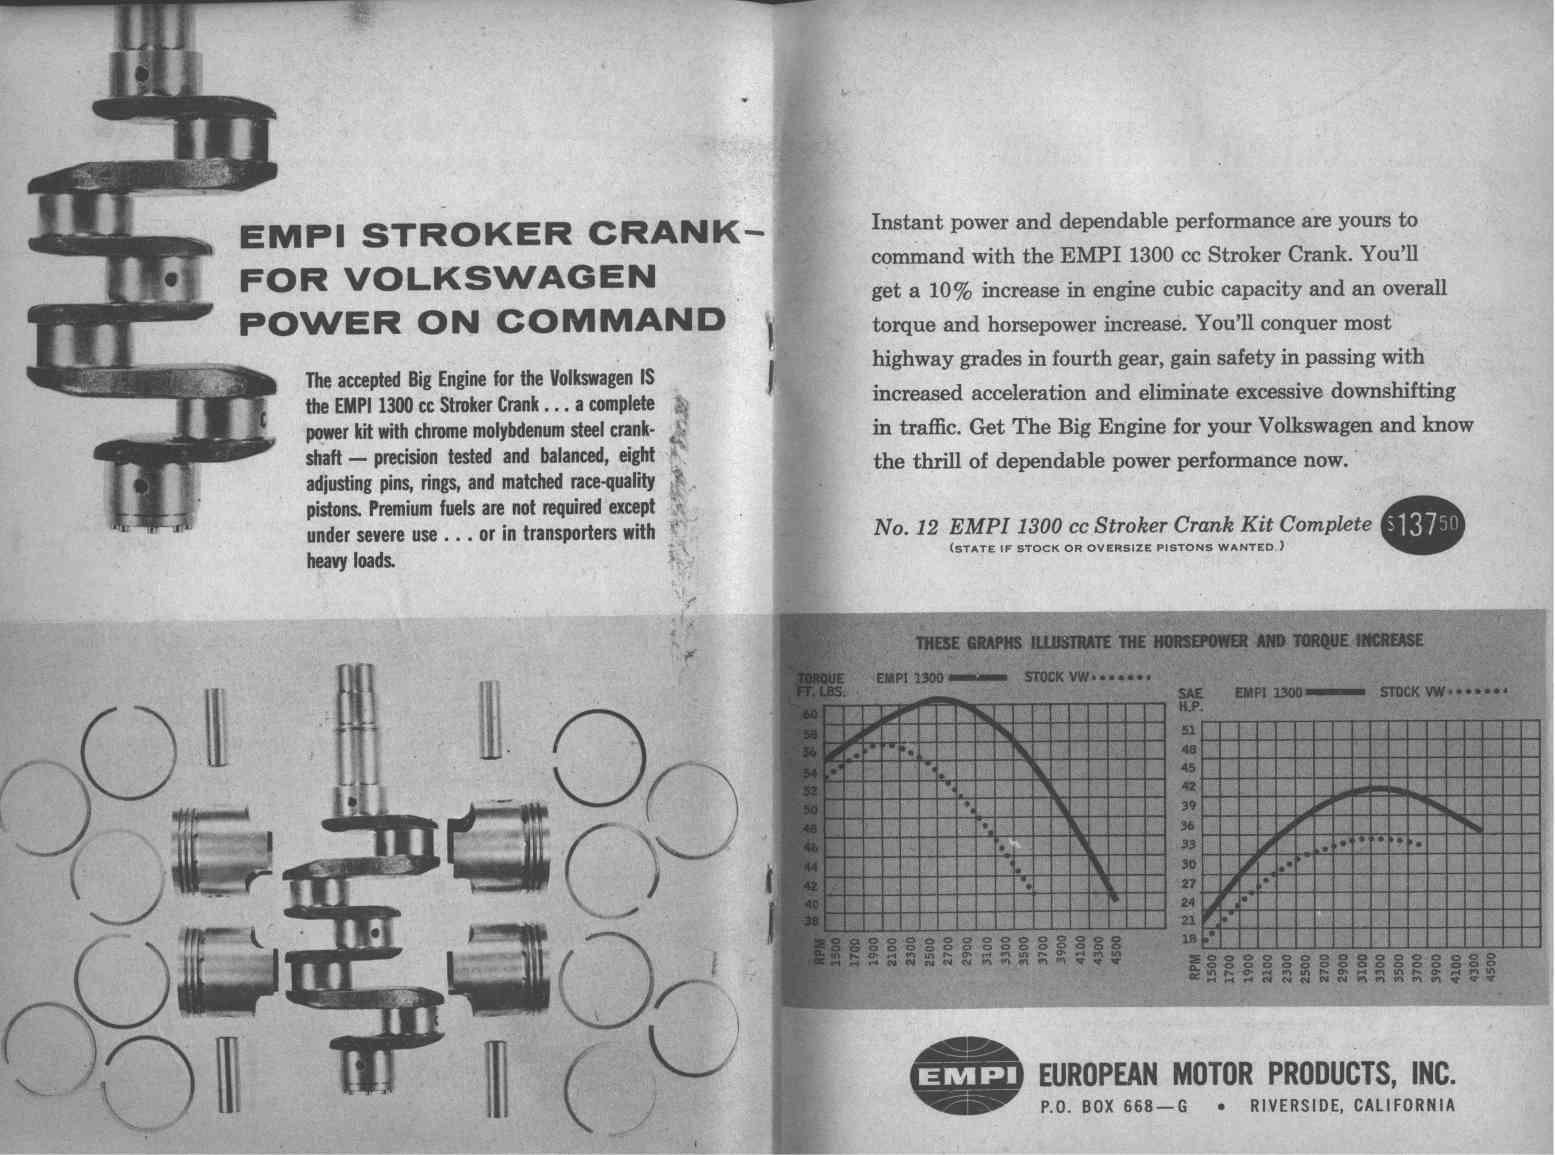 Oldspeed Vw Abarth Engine Piston Diagram En Cours